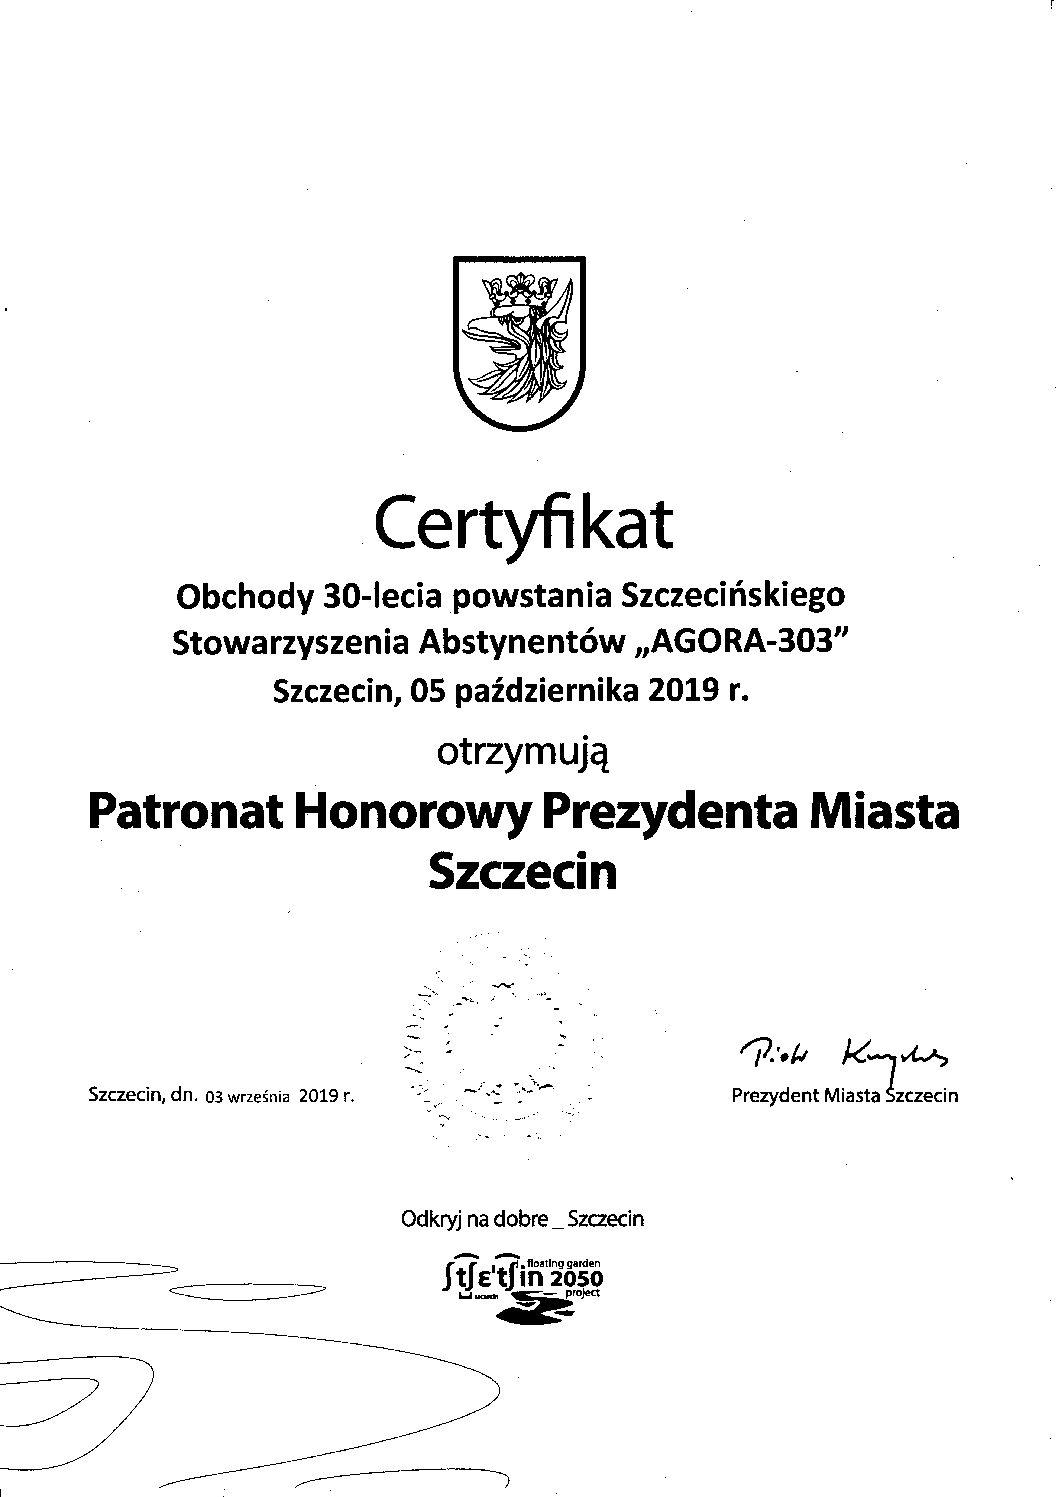 Patronat Prezydenta Miasta Szczecin